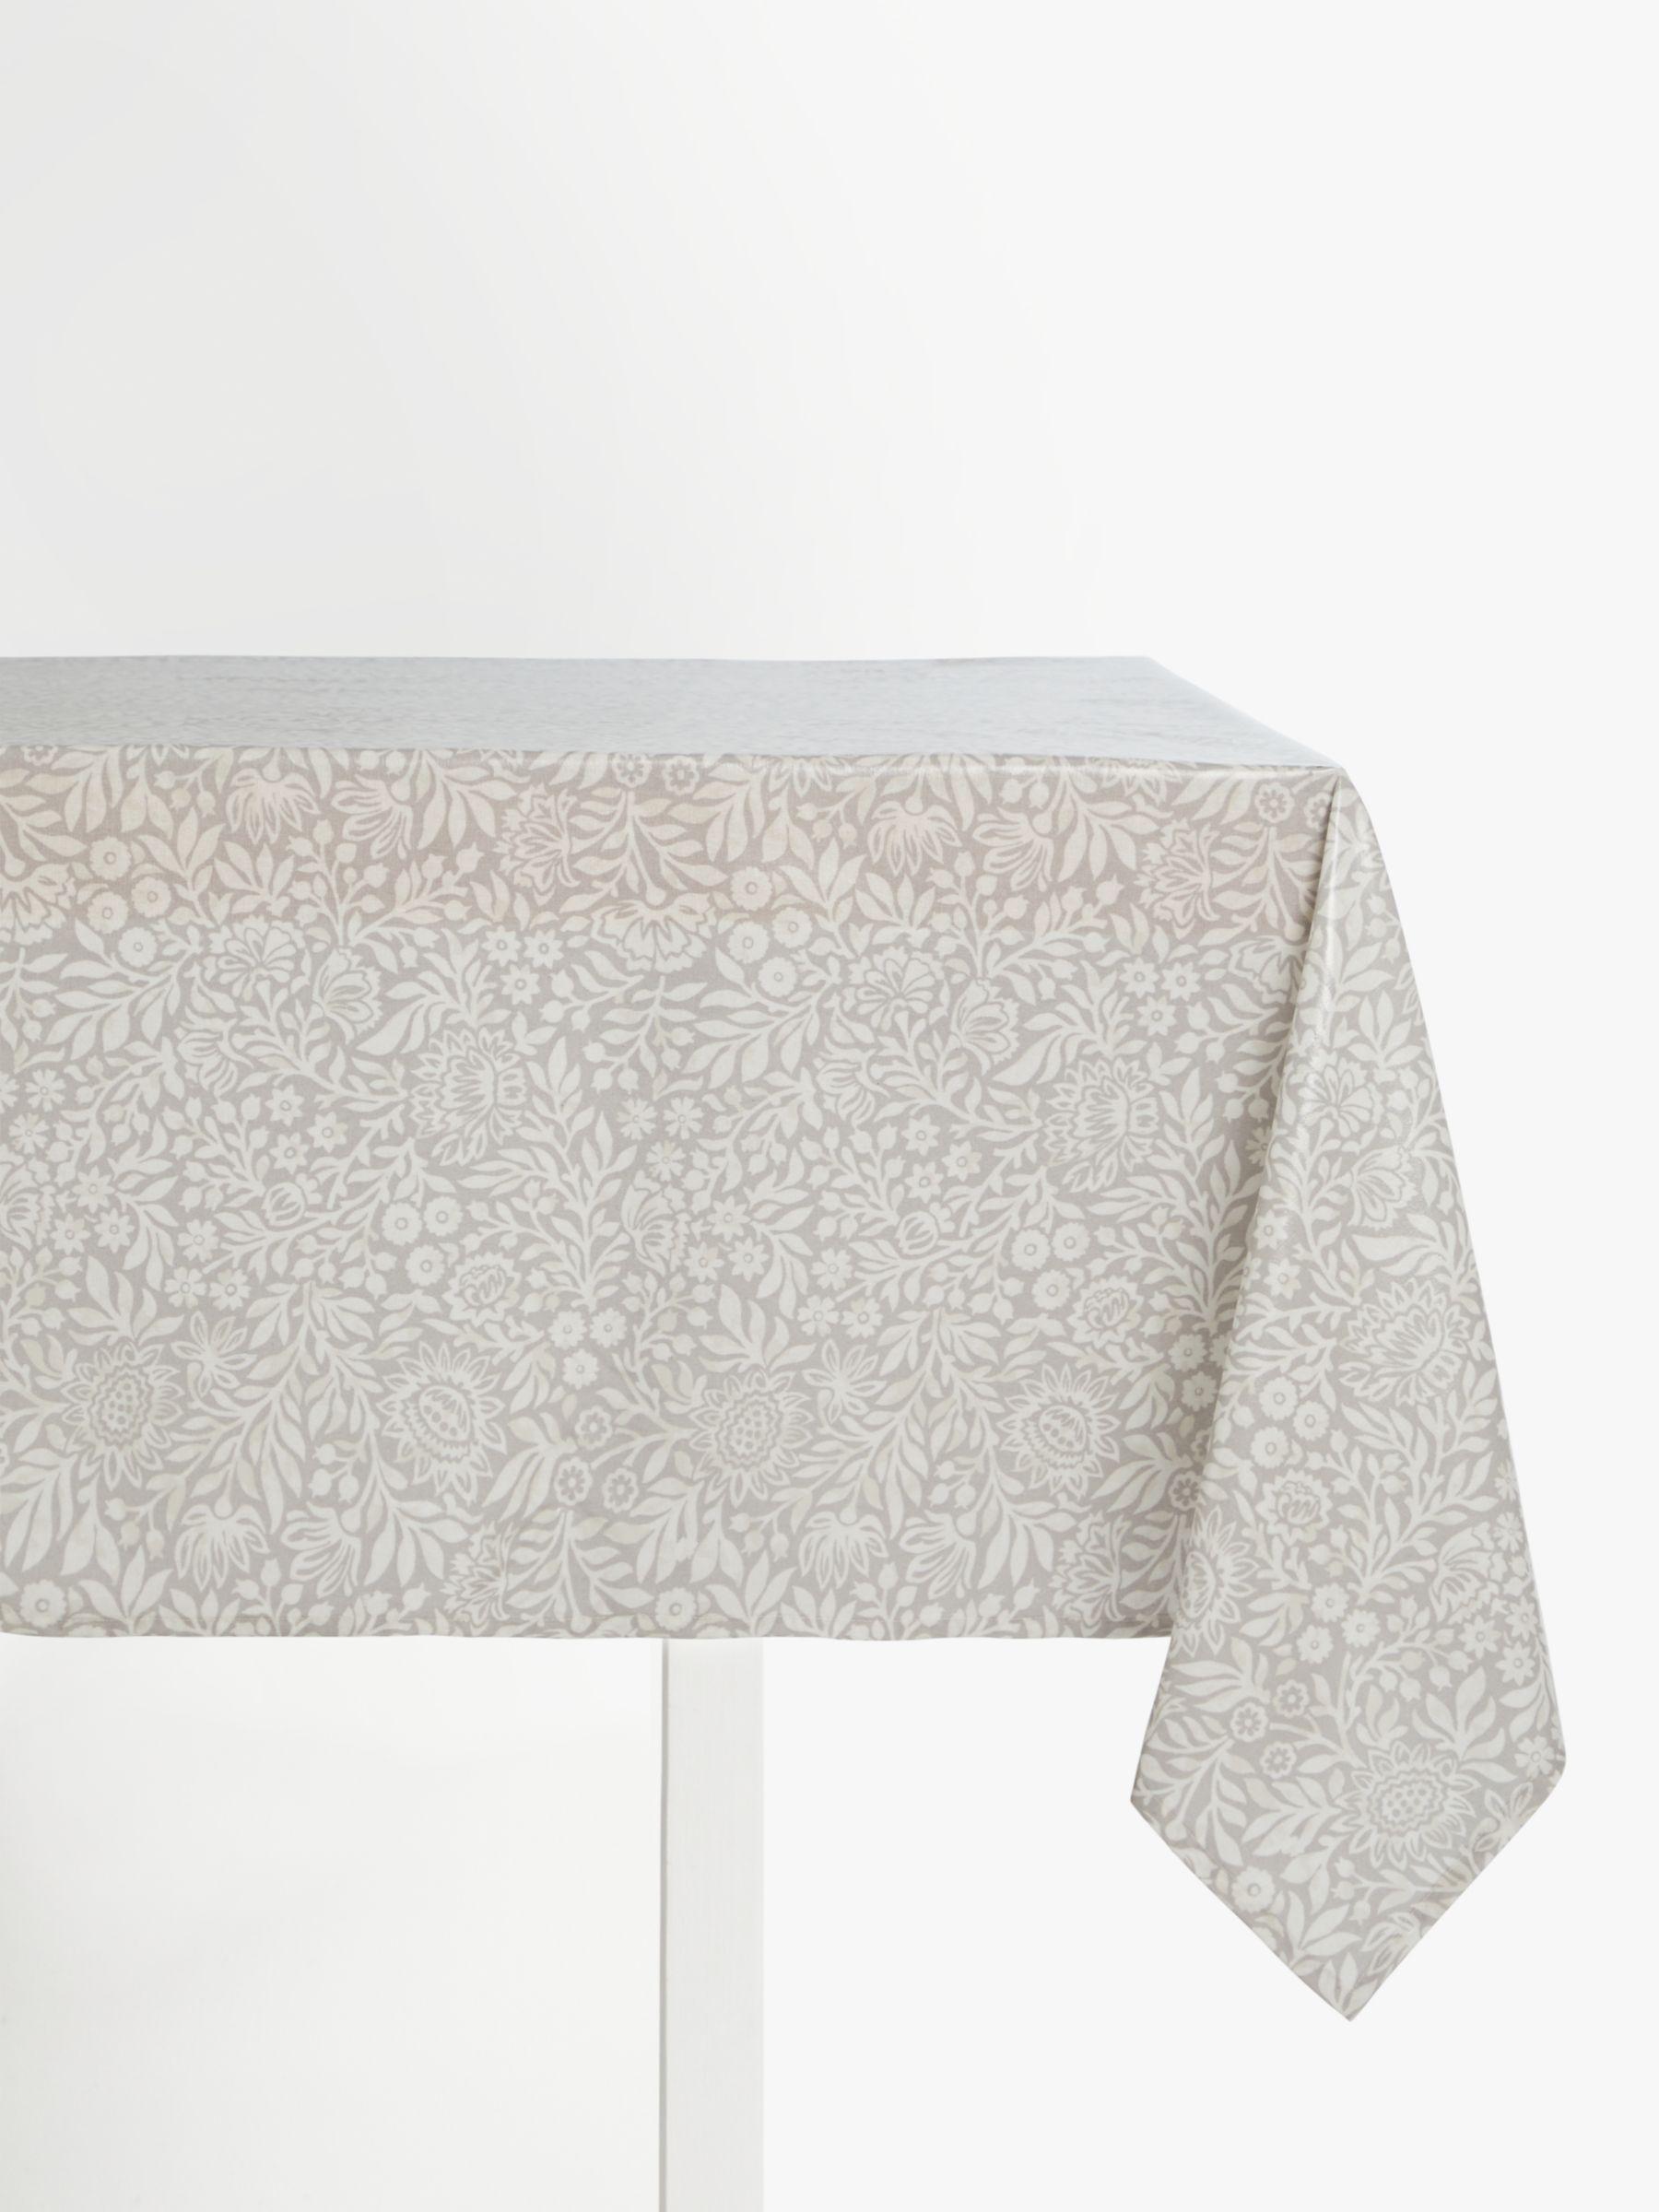 John Lewis Tablecloths Table Linens John Lewis Partners